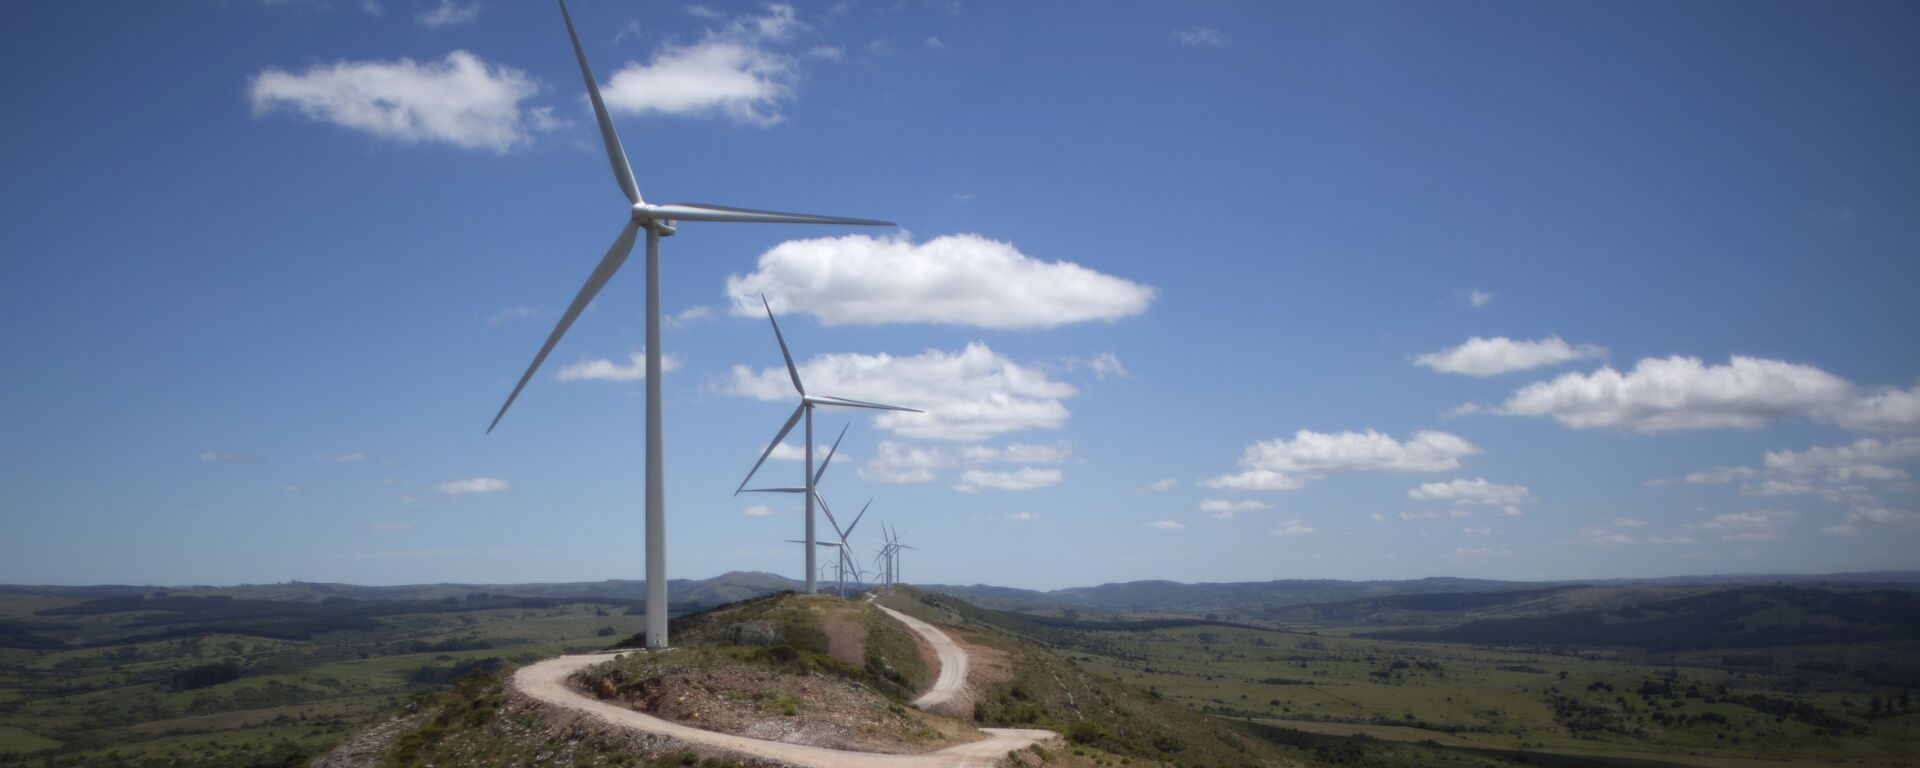 Wind turbines are seen at the Sierra de los Caracoles wind farm, in the department of Maldonado, east of Montevideo, on December 18, 2014.  - Sputnik Mundo, 1920, 17.08.2021